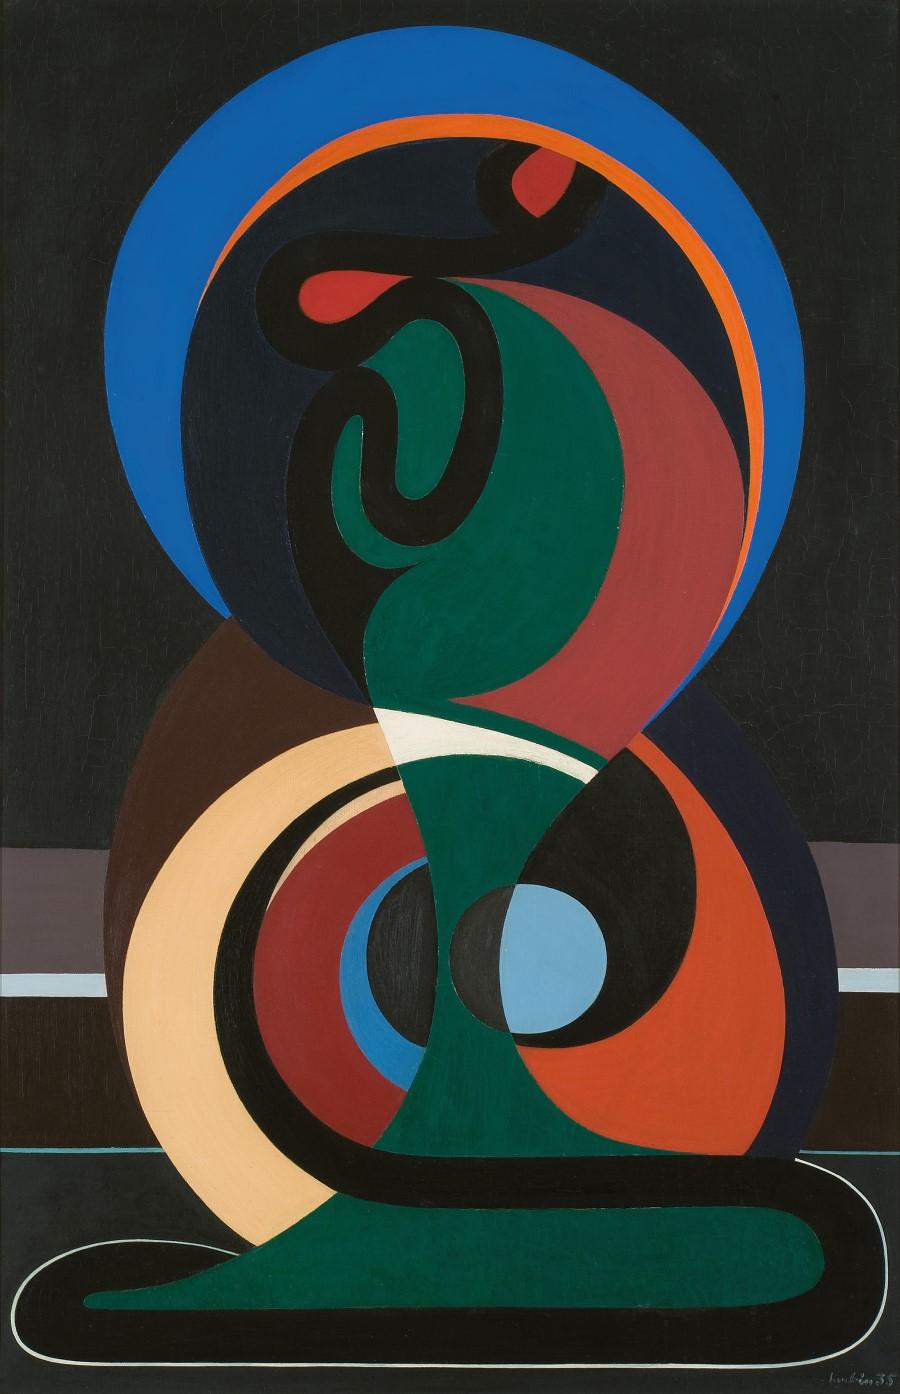 Auguste Herbin: Kompozicio, 1935, Párizs, Galerie Le Minotaure ©archives galerie Le Minotaure